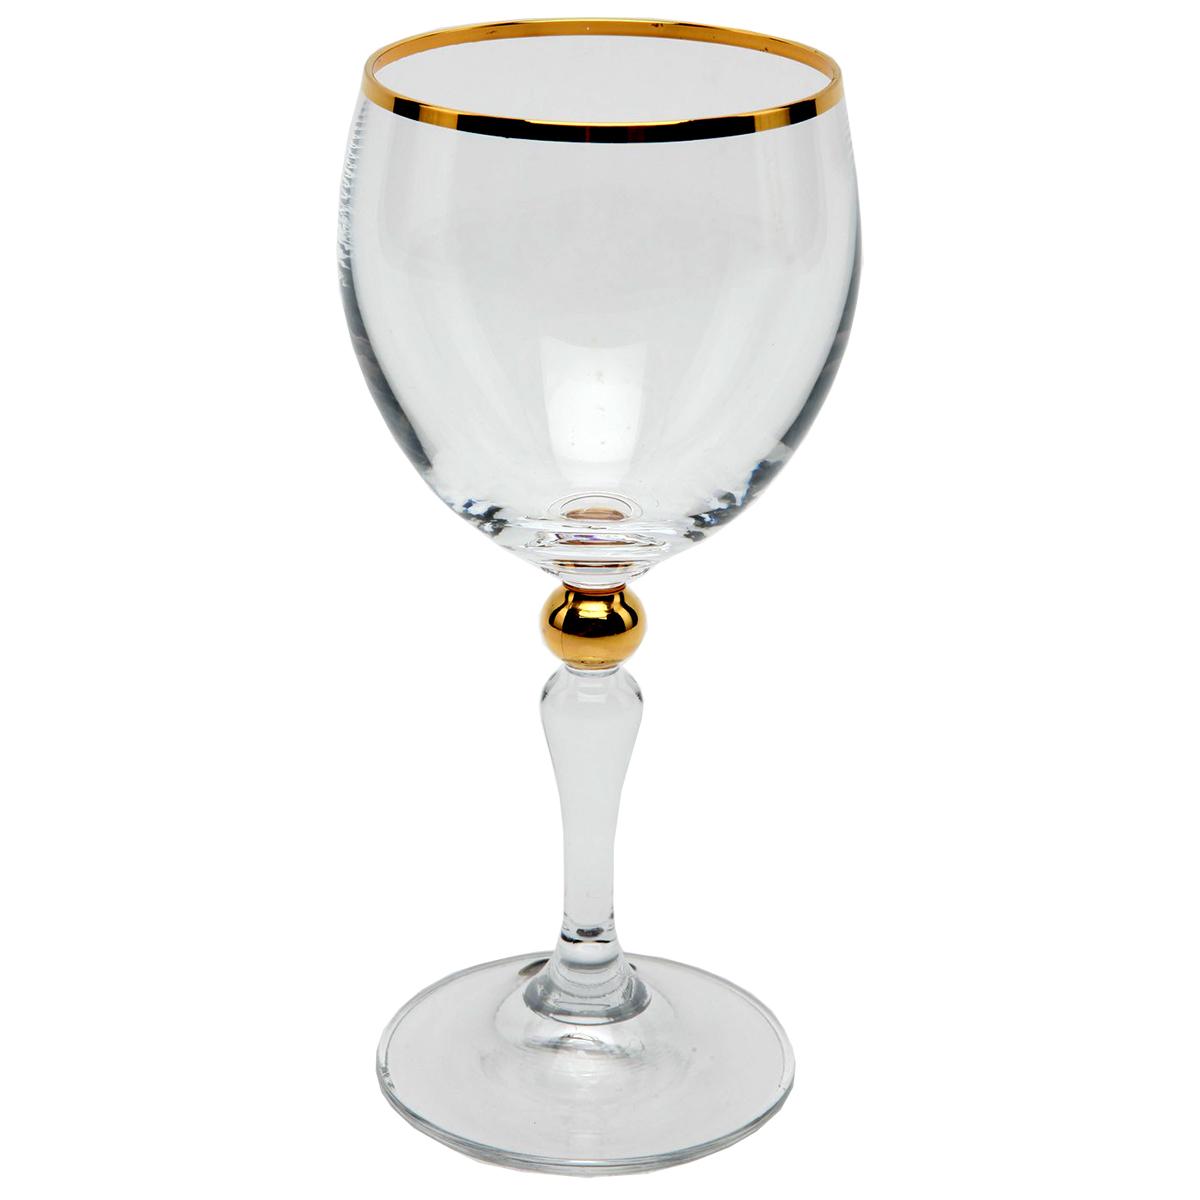 Набор бокалов для шампанского Bohemia Crystal Кармен, 190 мл, 6 шт набор бокалов для шампанского bohemia crystal анжела 190 мл 6 шт 40600 q8997 190